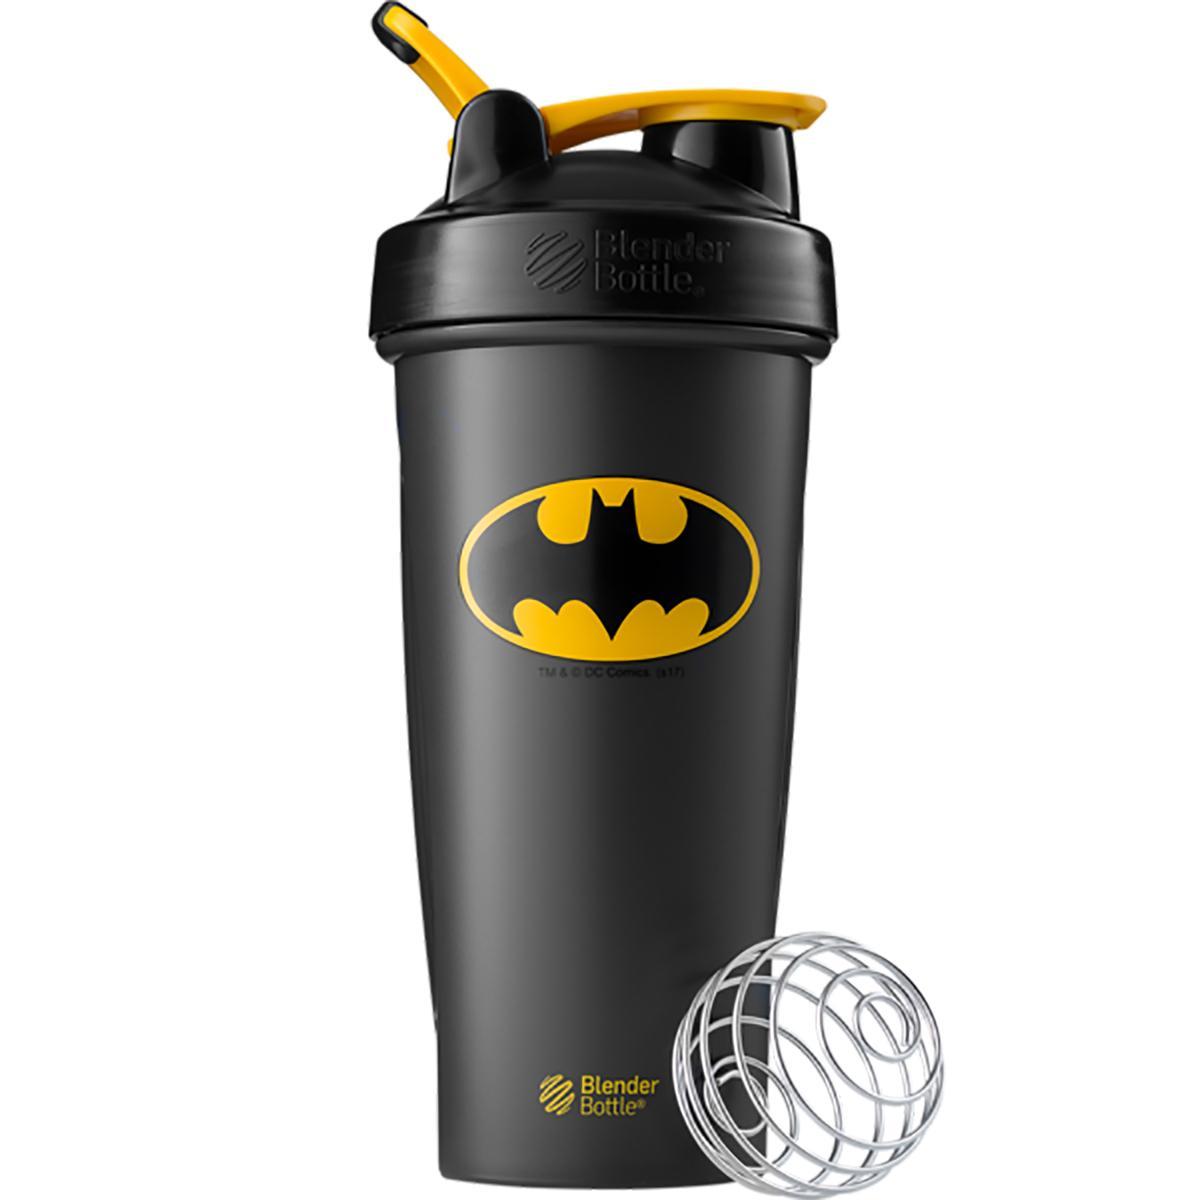 The Cheapest Blender Bottle Dc Comics Superhero 28 Oz Classic Bottle Batman Online